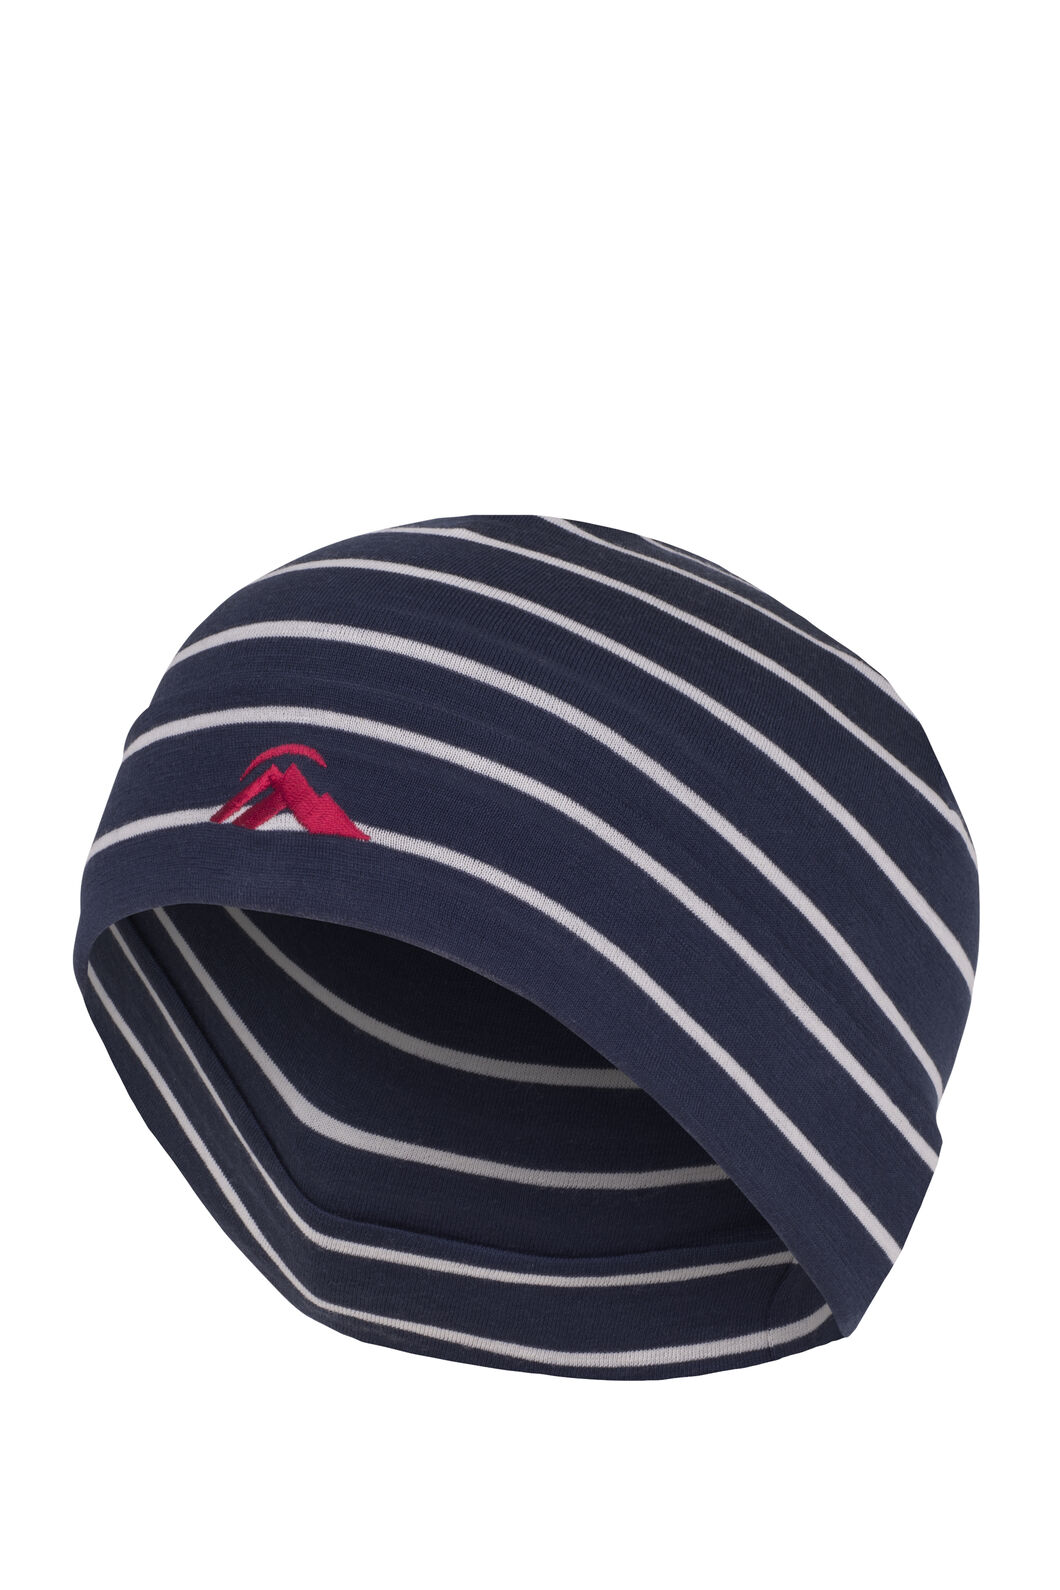 Macpac Merino 150 Beanie, Black Iris Stripe, hi-res